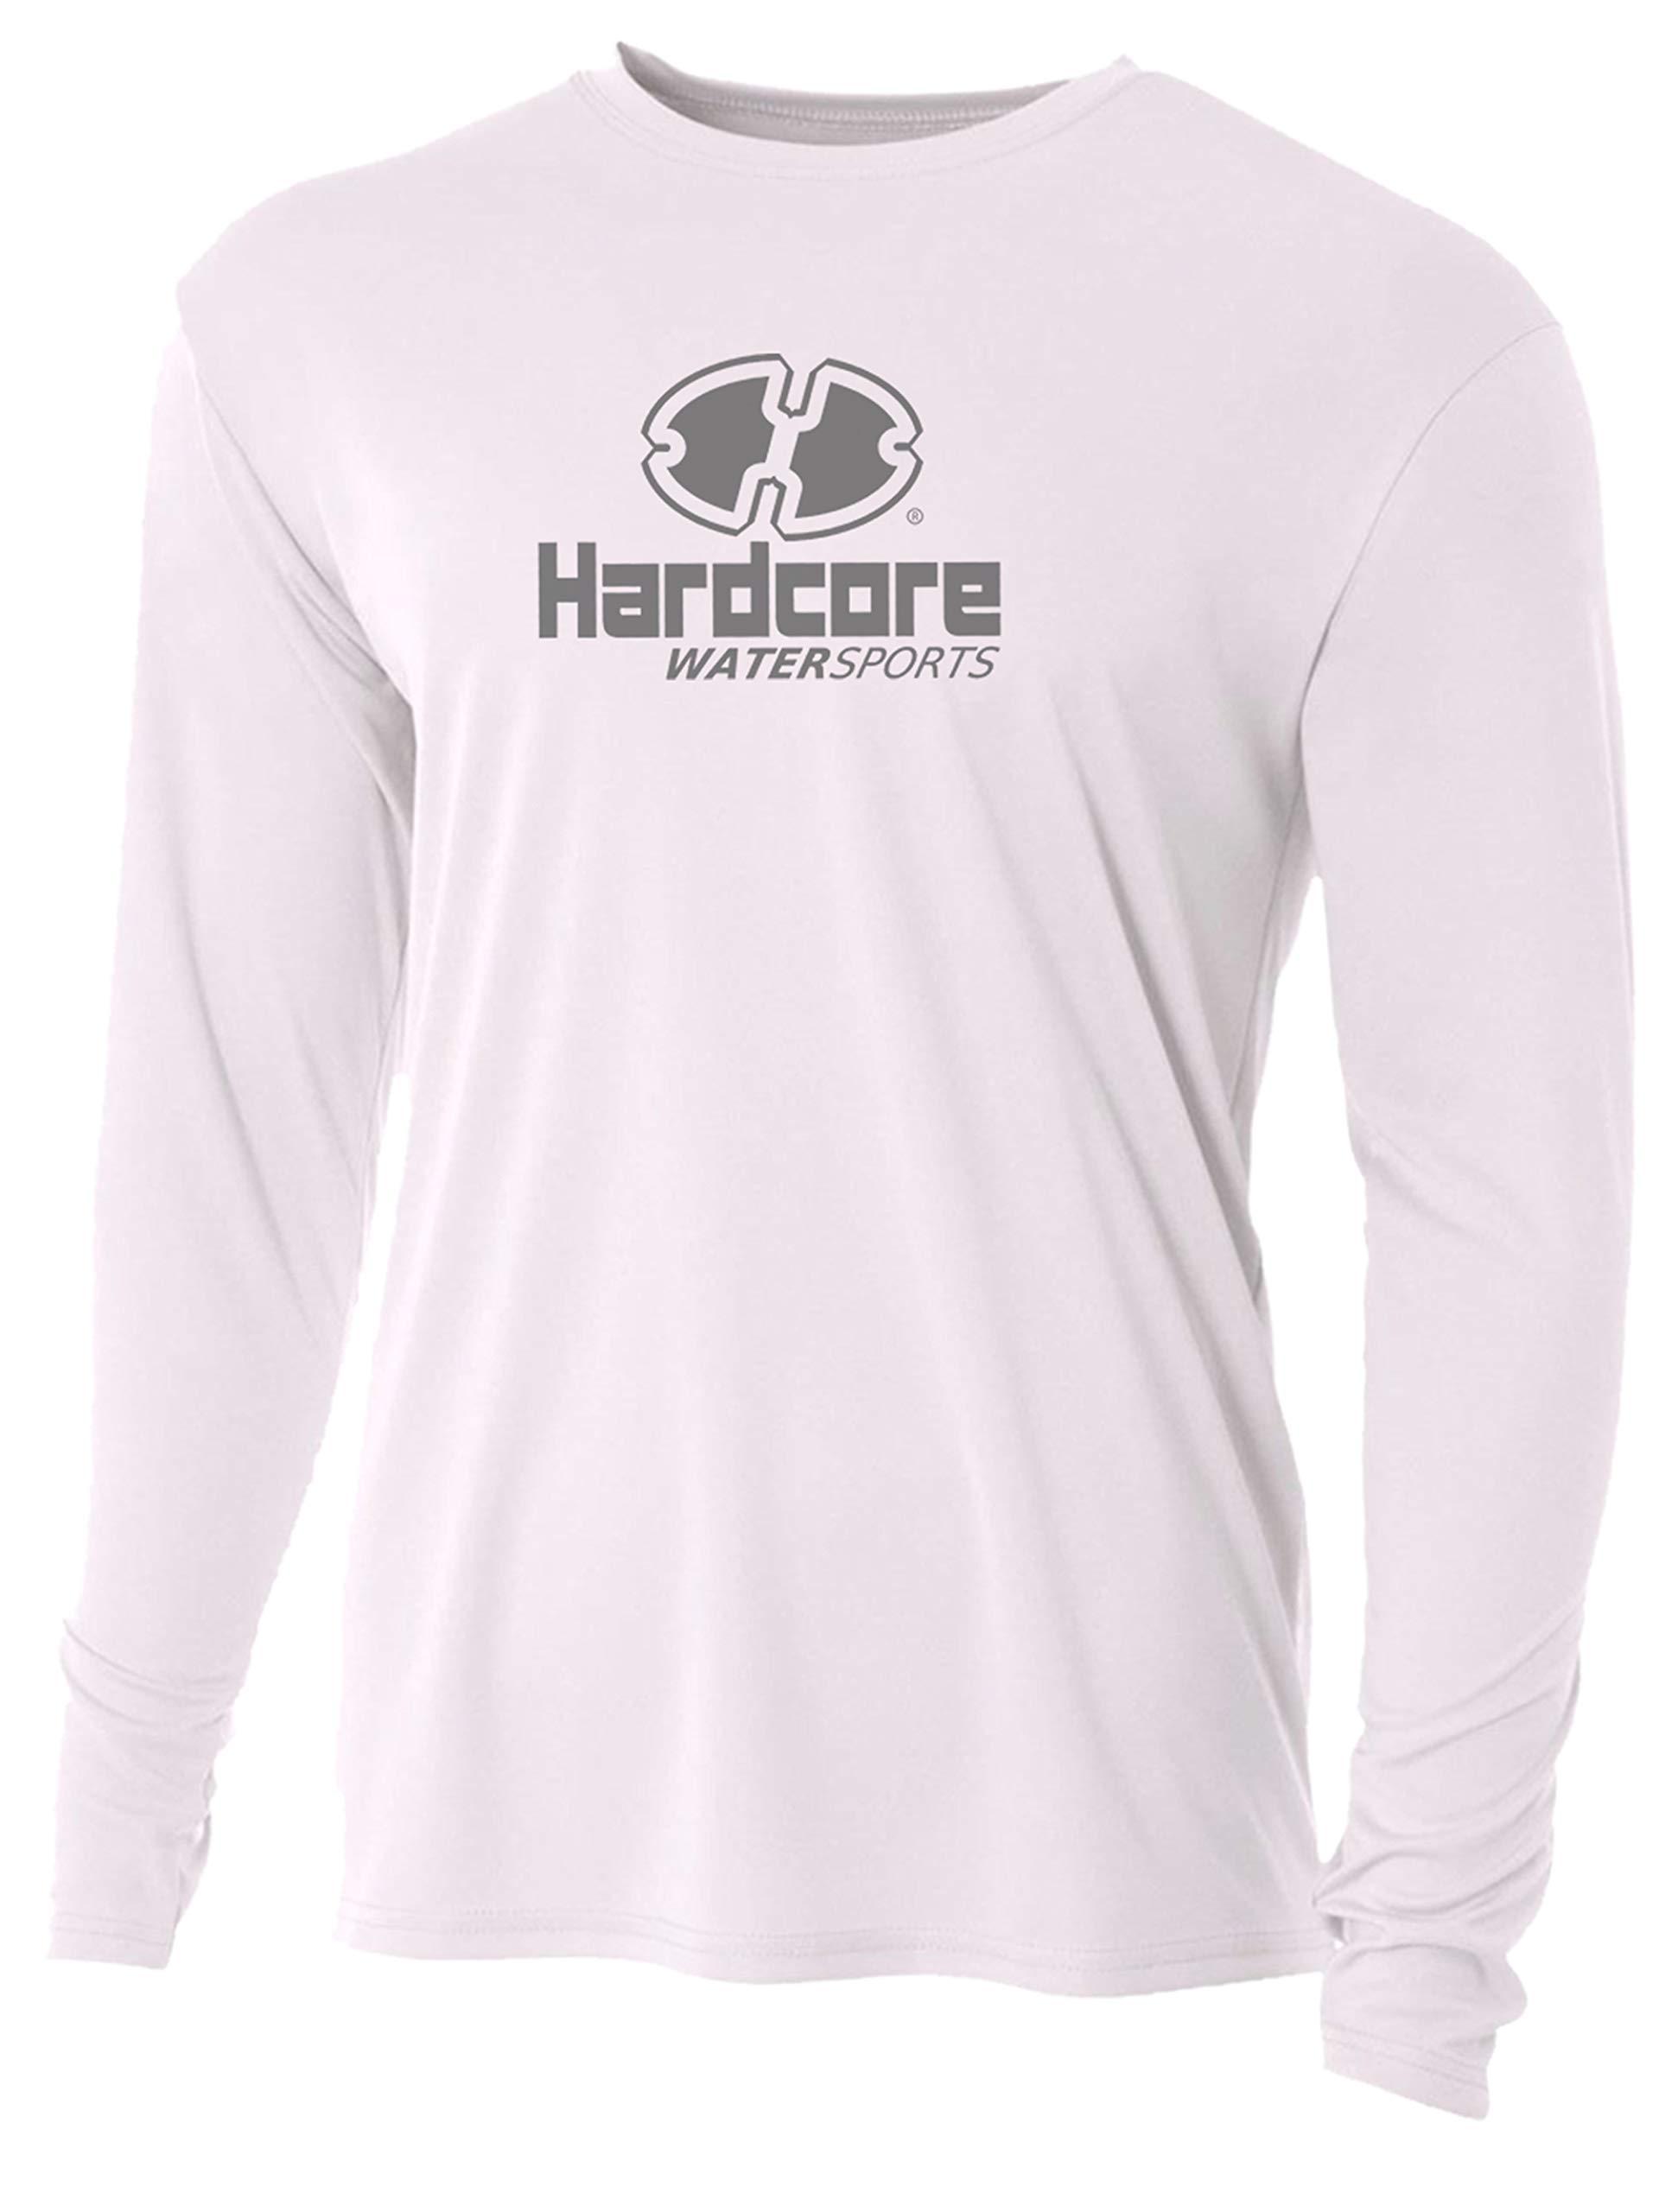 Men's Long Sleeve Loose Fit Rash Guard Surf Shirt Water Sports Swimwear White by Hardcore Water Sports